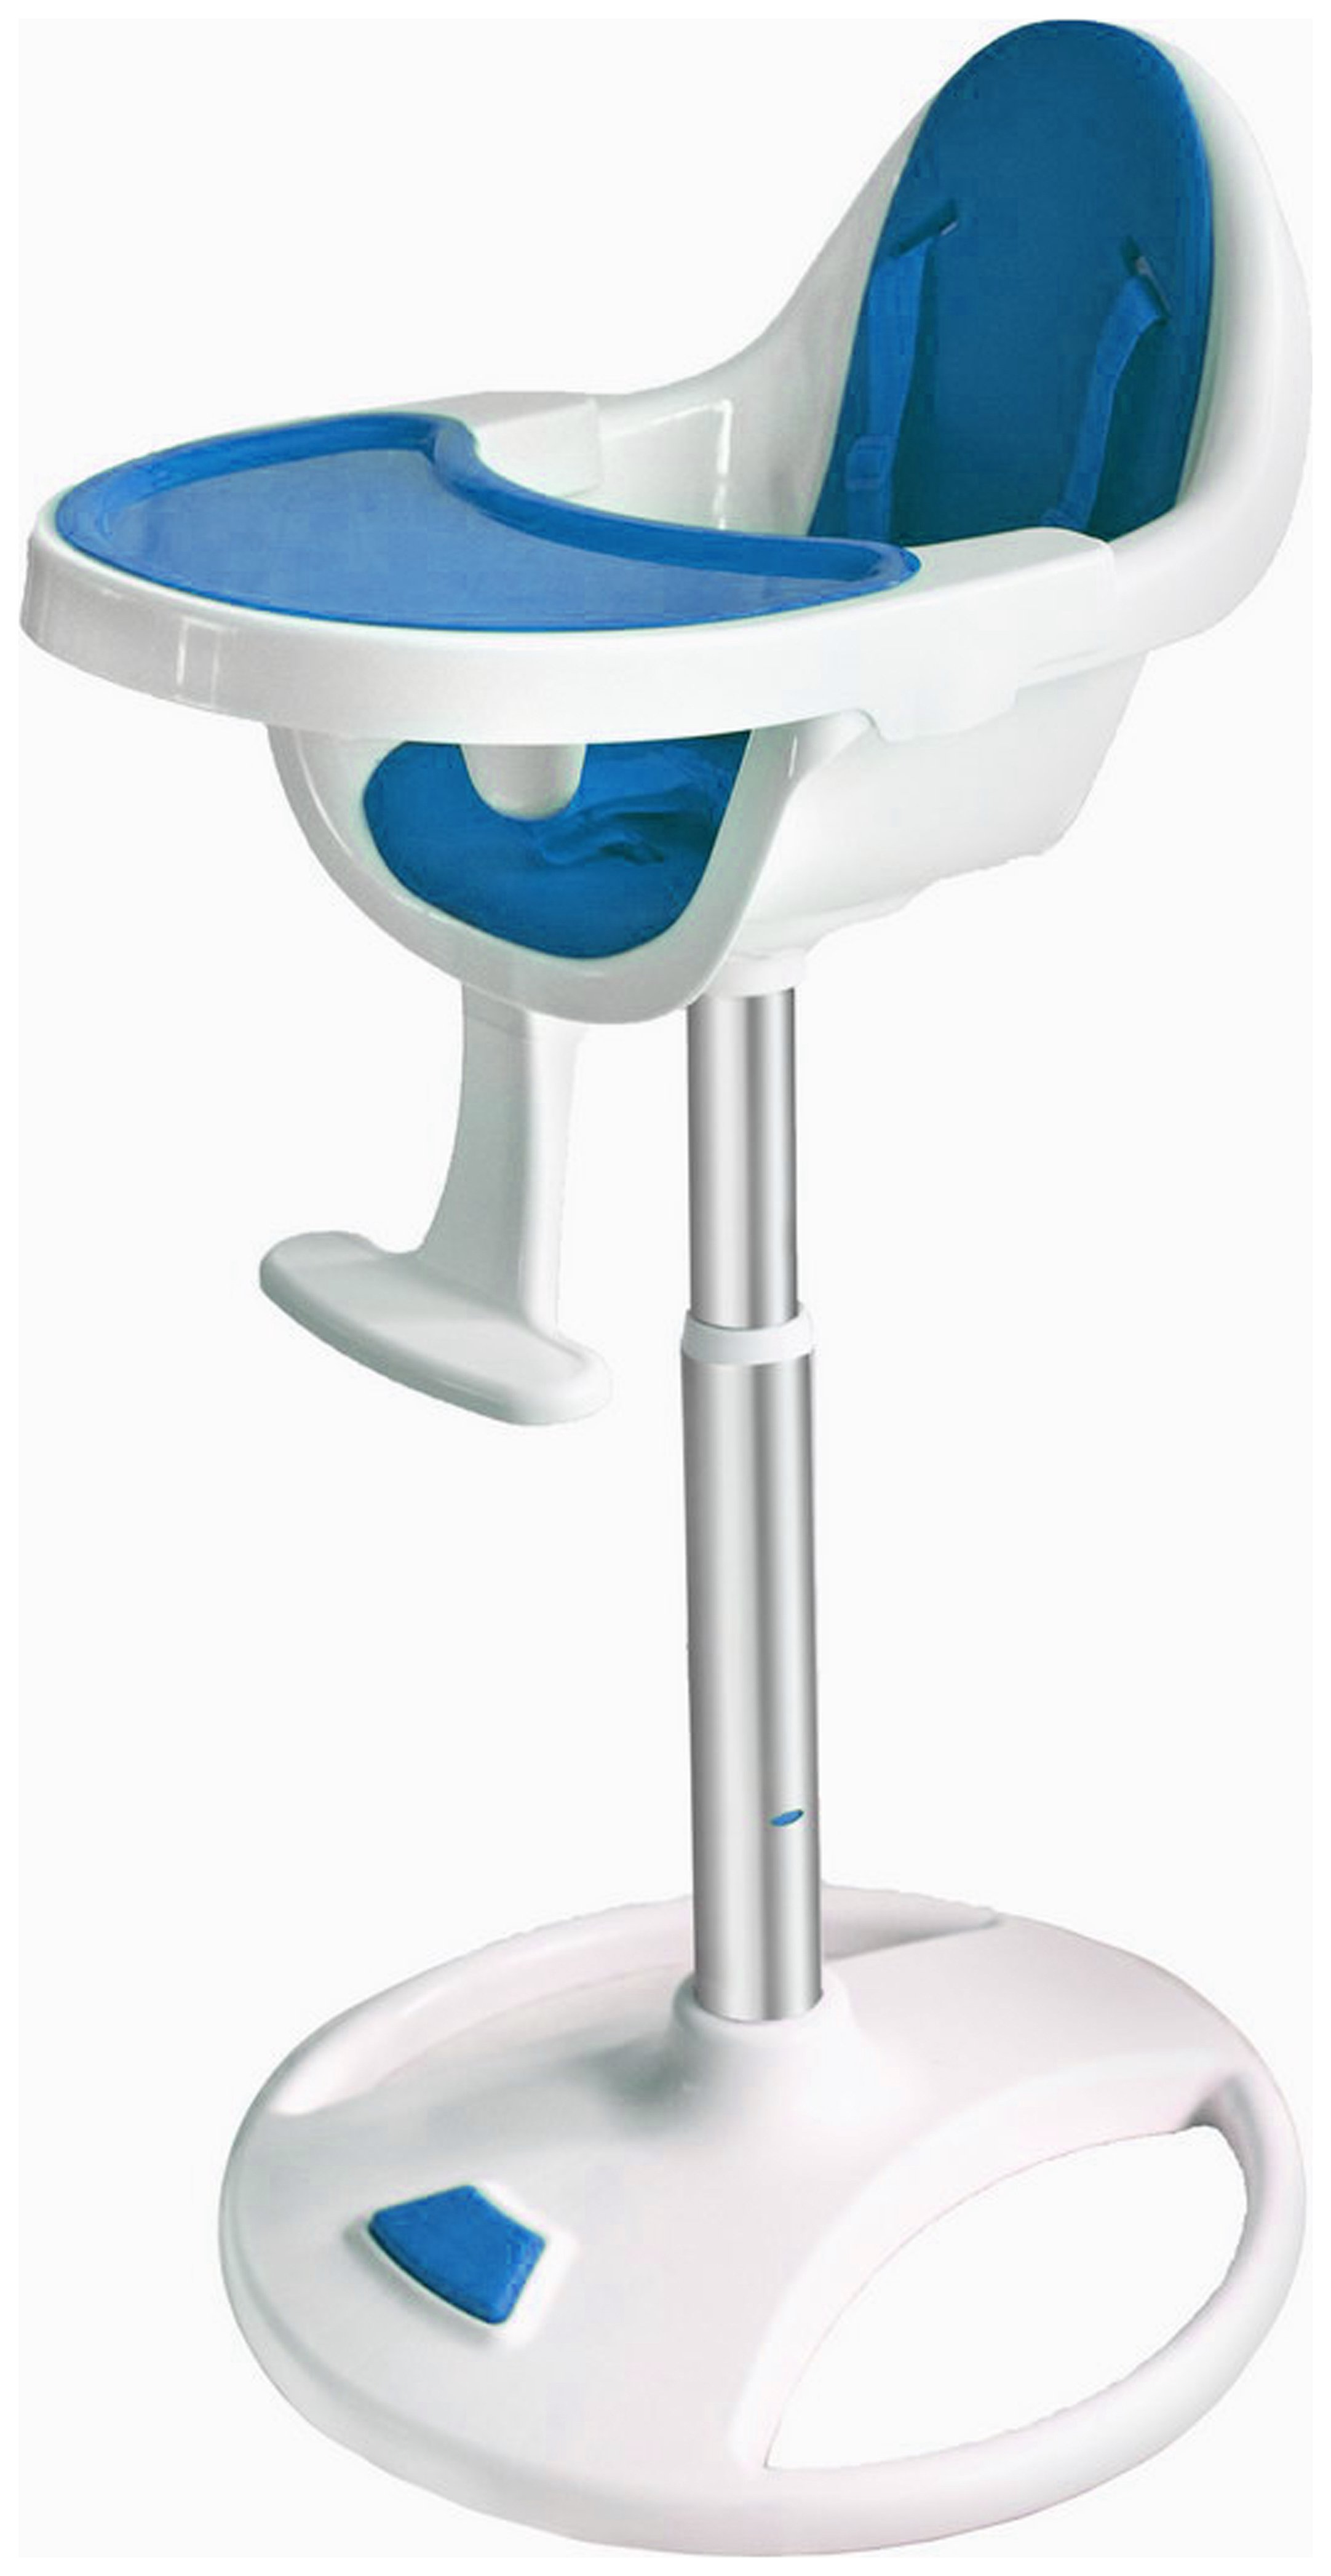 Image of BeBe - Style 360 Swivel - Highchair - Blue